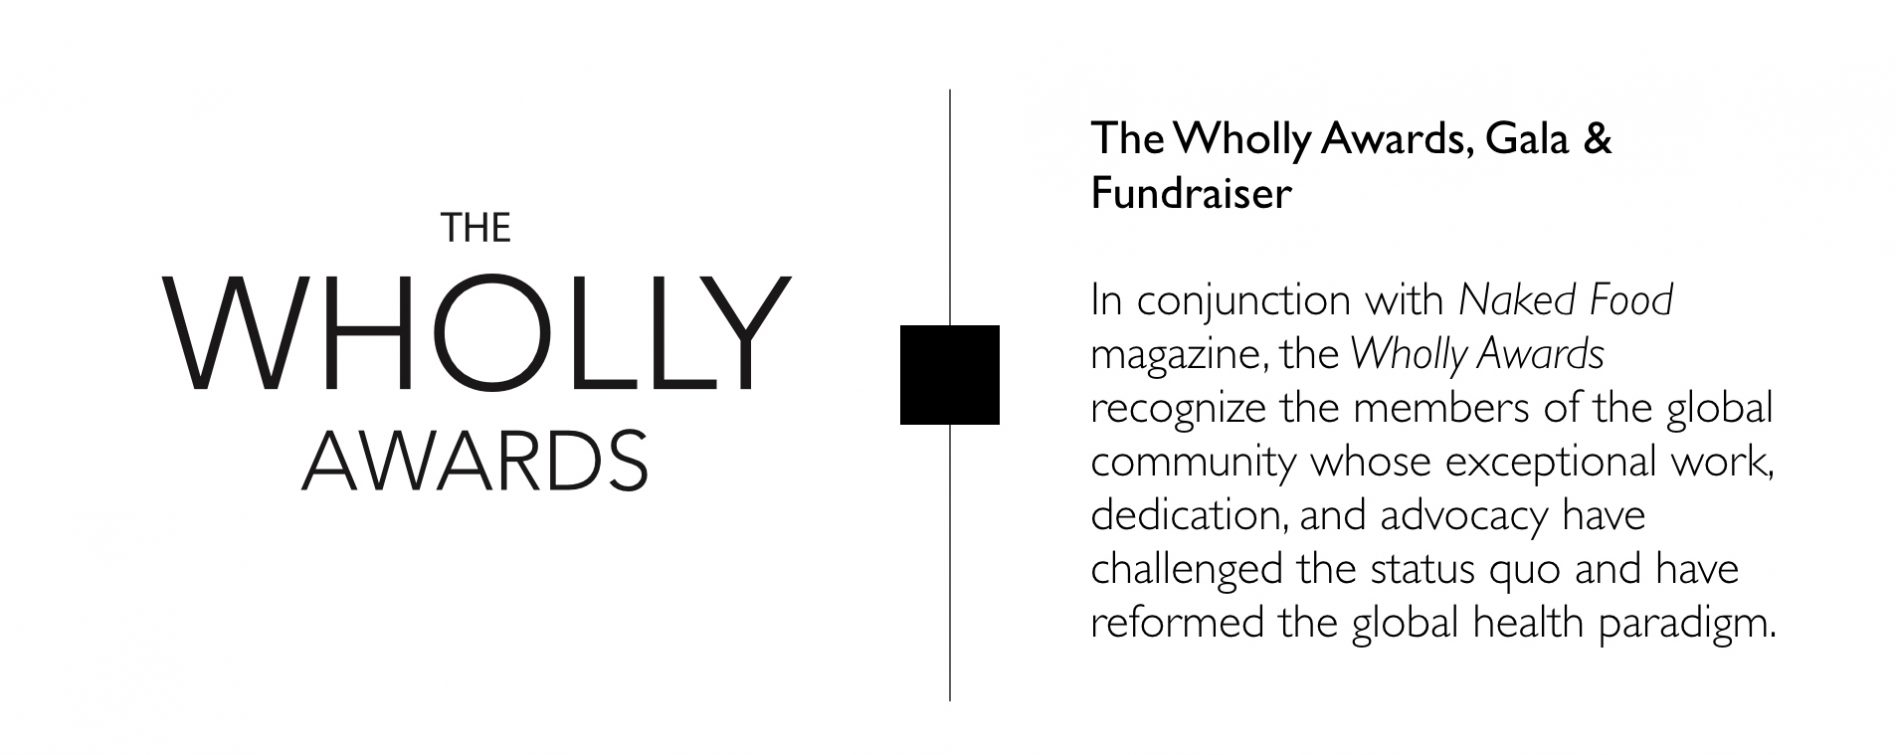 WFPB.ORG   Wholly Awards